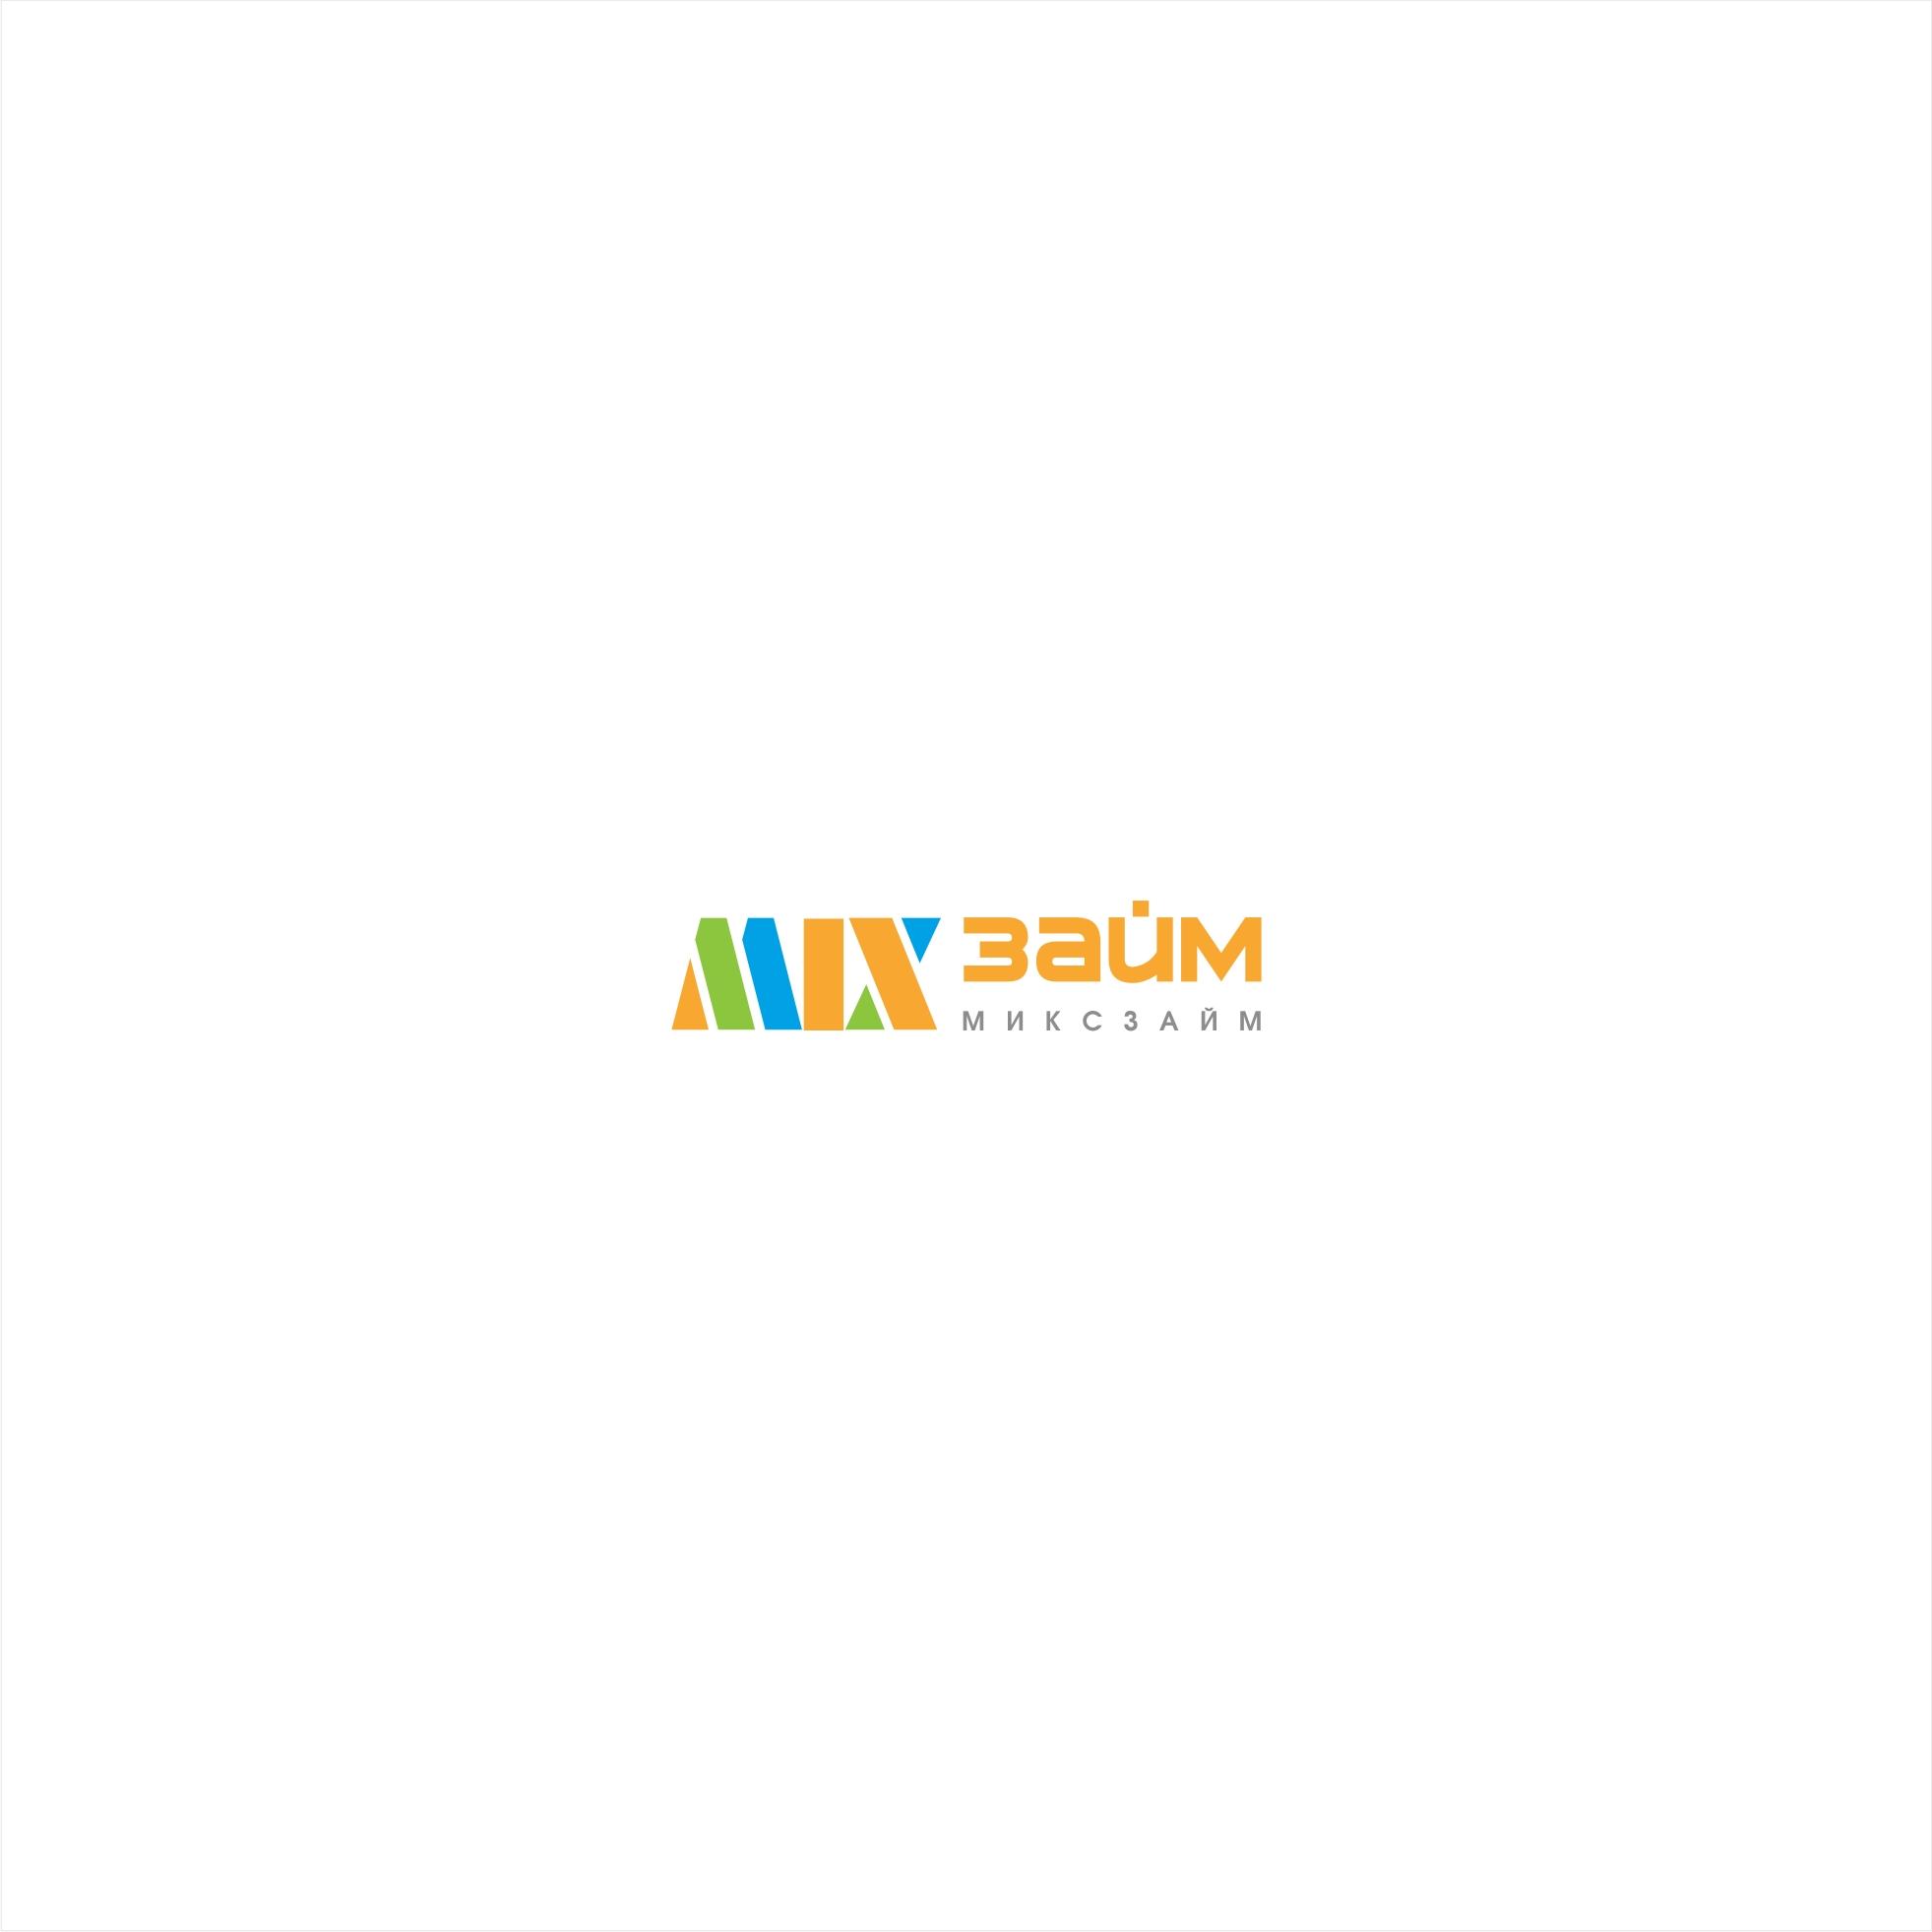 Разработать логотип фото f_2245ad871866b7fb.jpg